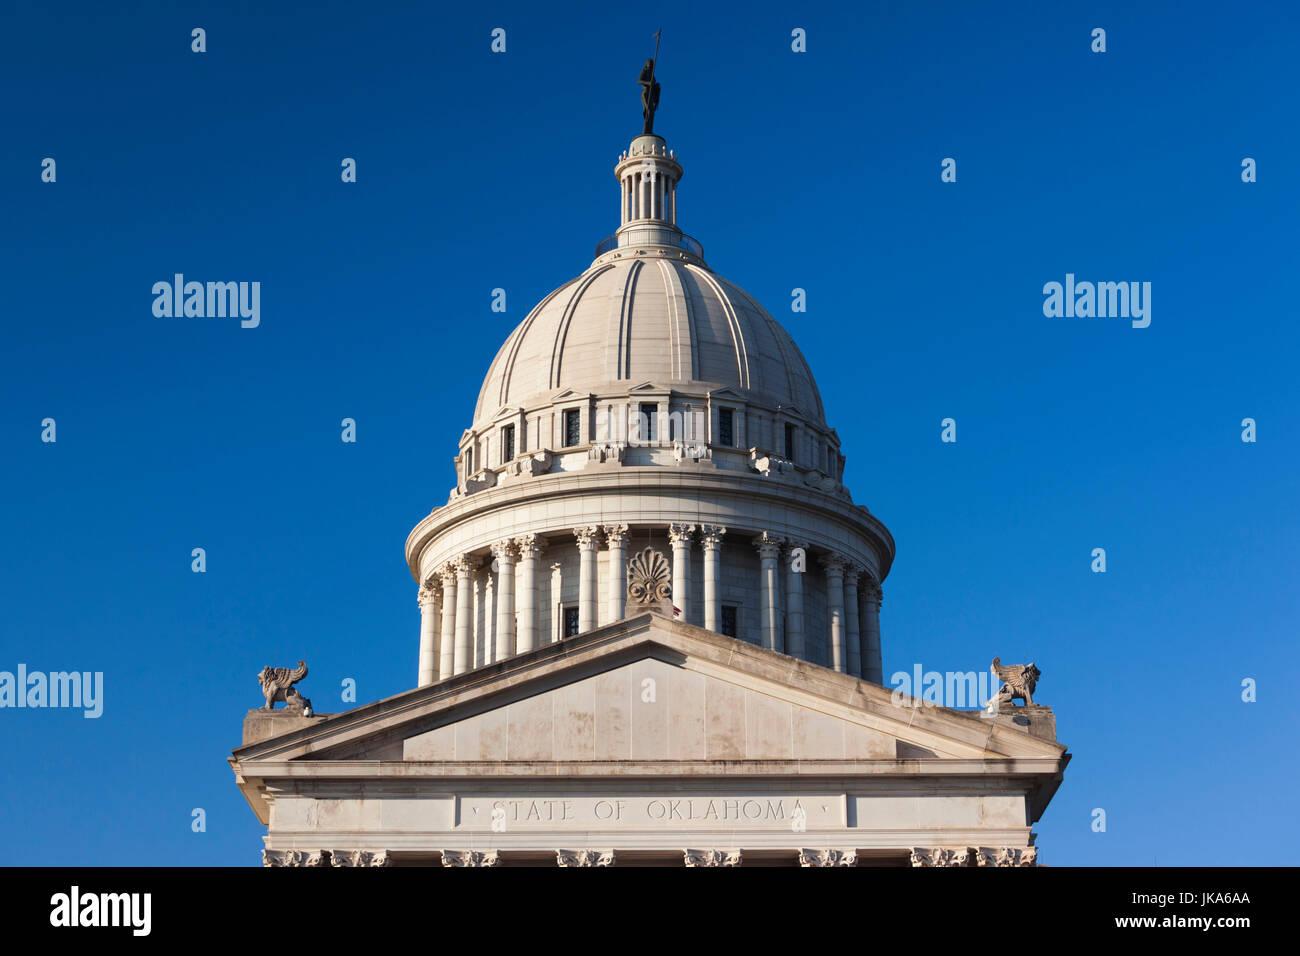 USA, Oklahoma, Oklahoma City, Oklahoma State Capitol Building Stock Photo